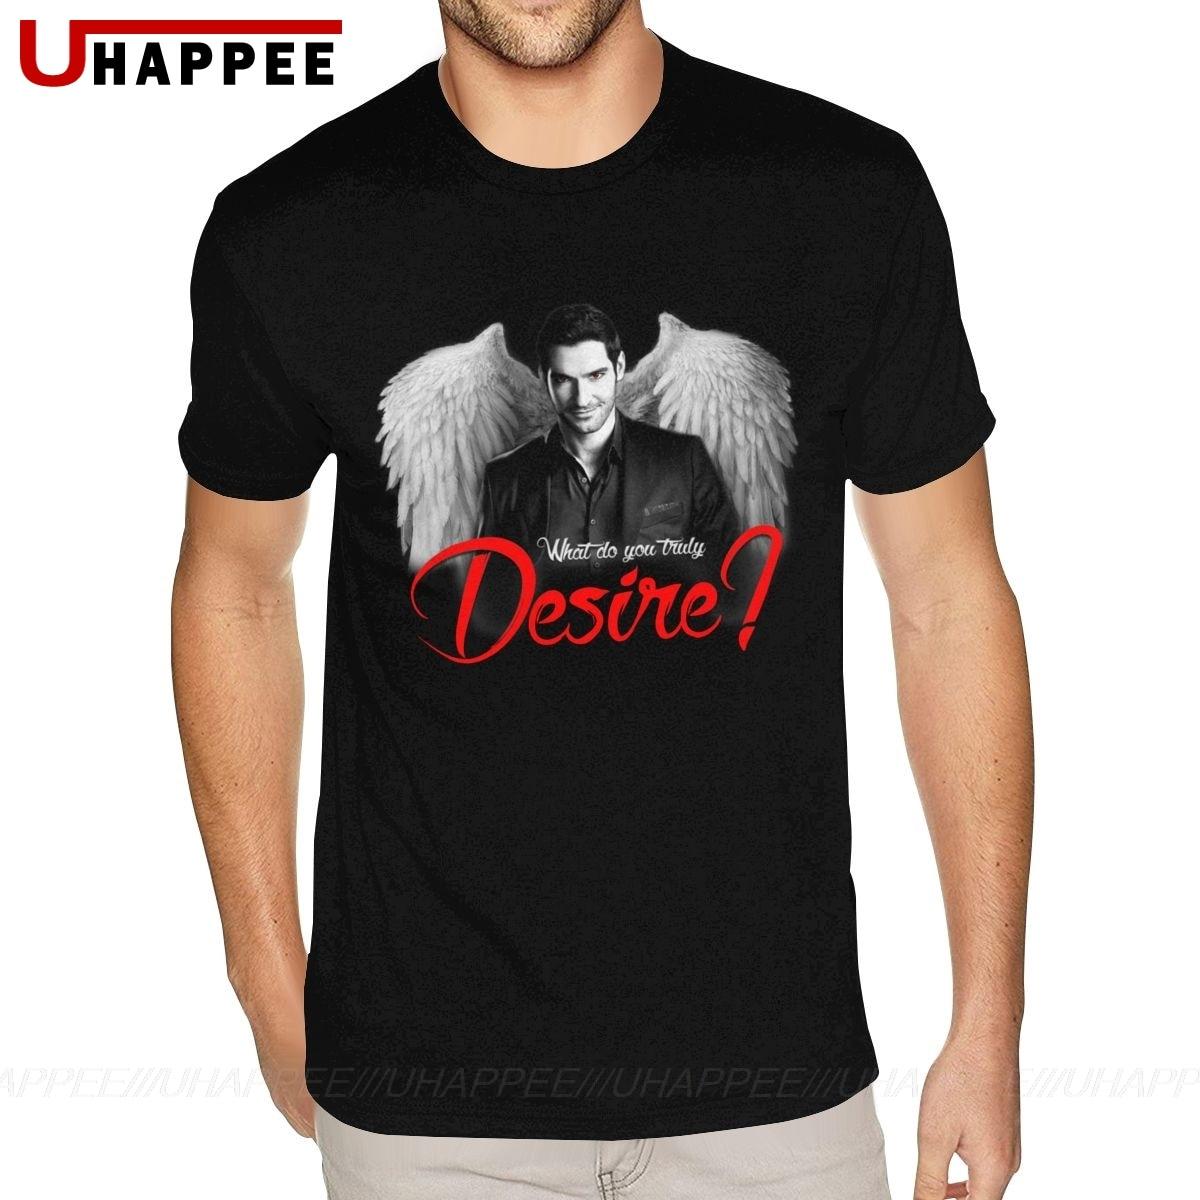 Oversized Lucifer Morningstar Tshirt Mens Grunge Fashion Short Sleeves O Neck Man T Shirt Summer Cheap Discount Merch Apparel